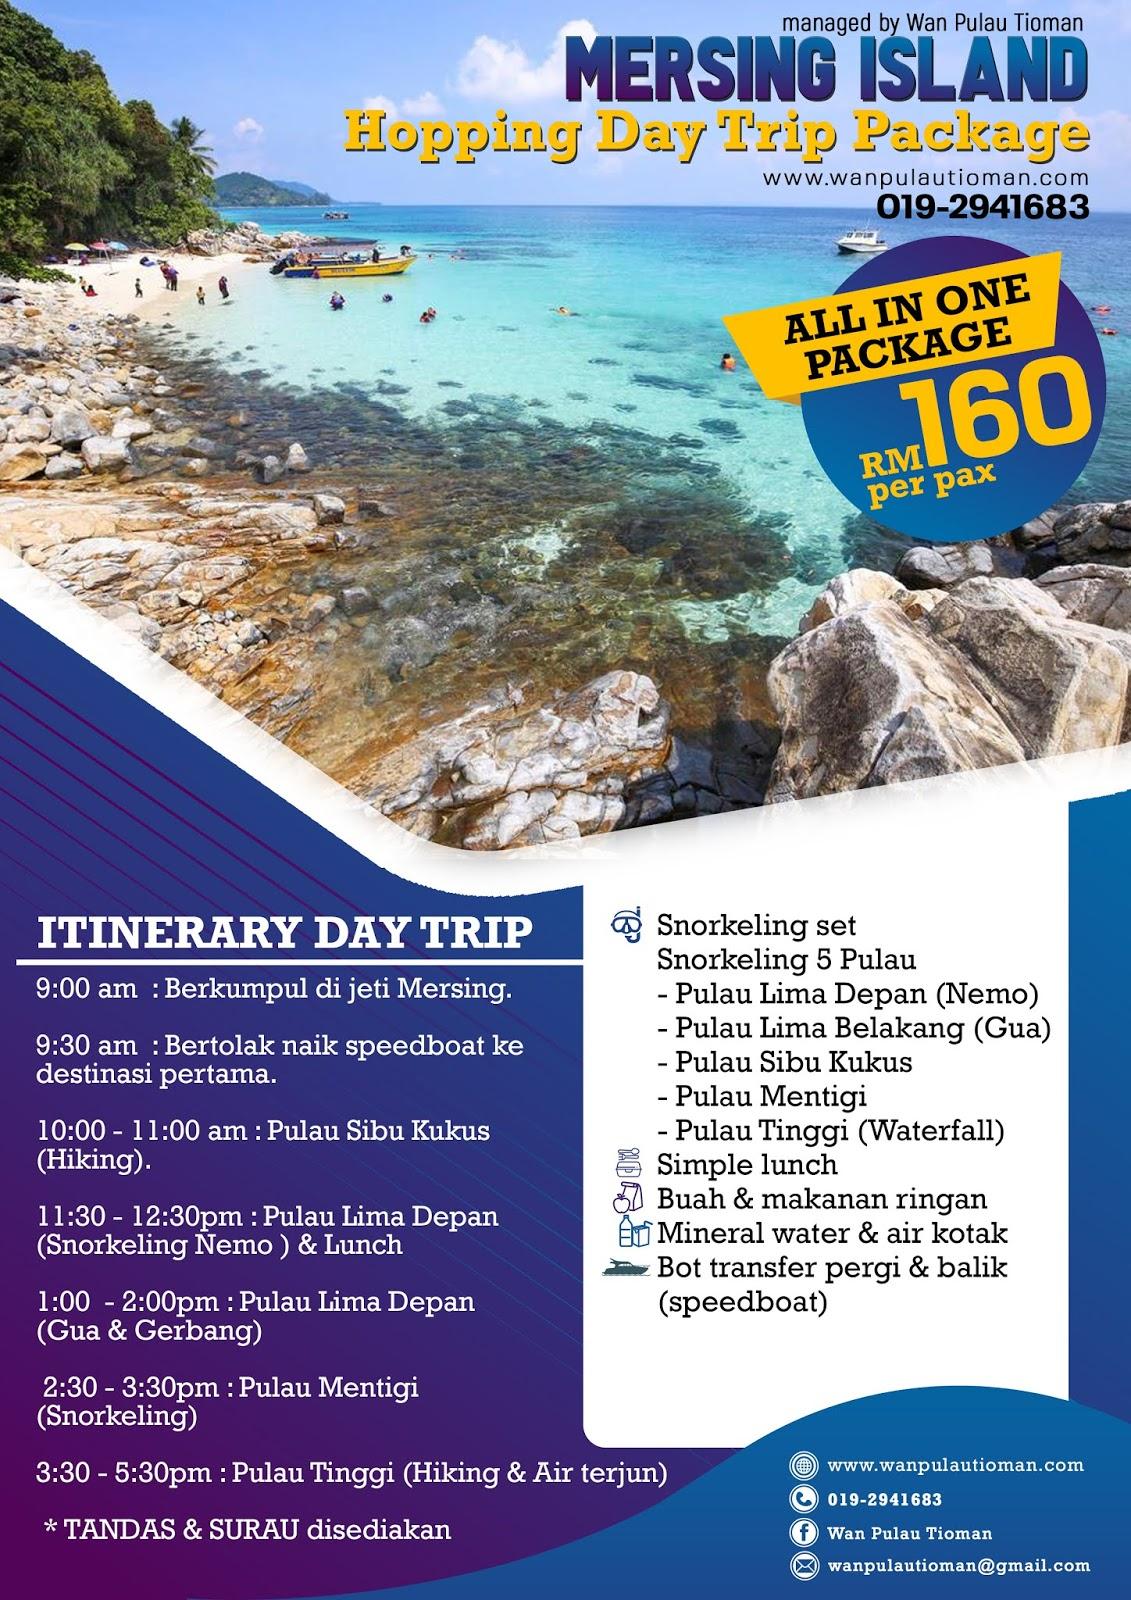 Mersing Island Hopping Day Trip Package | Percutian Pulau